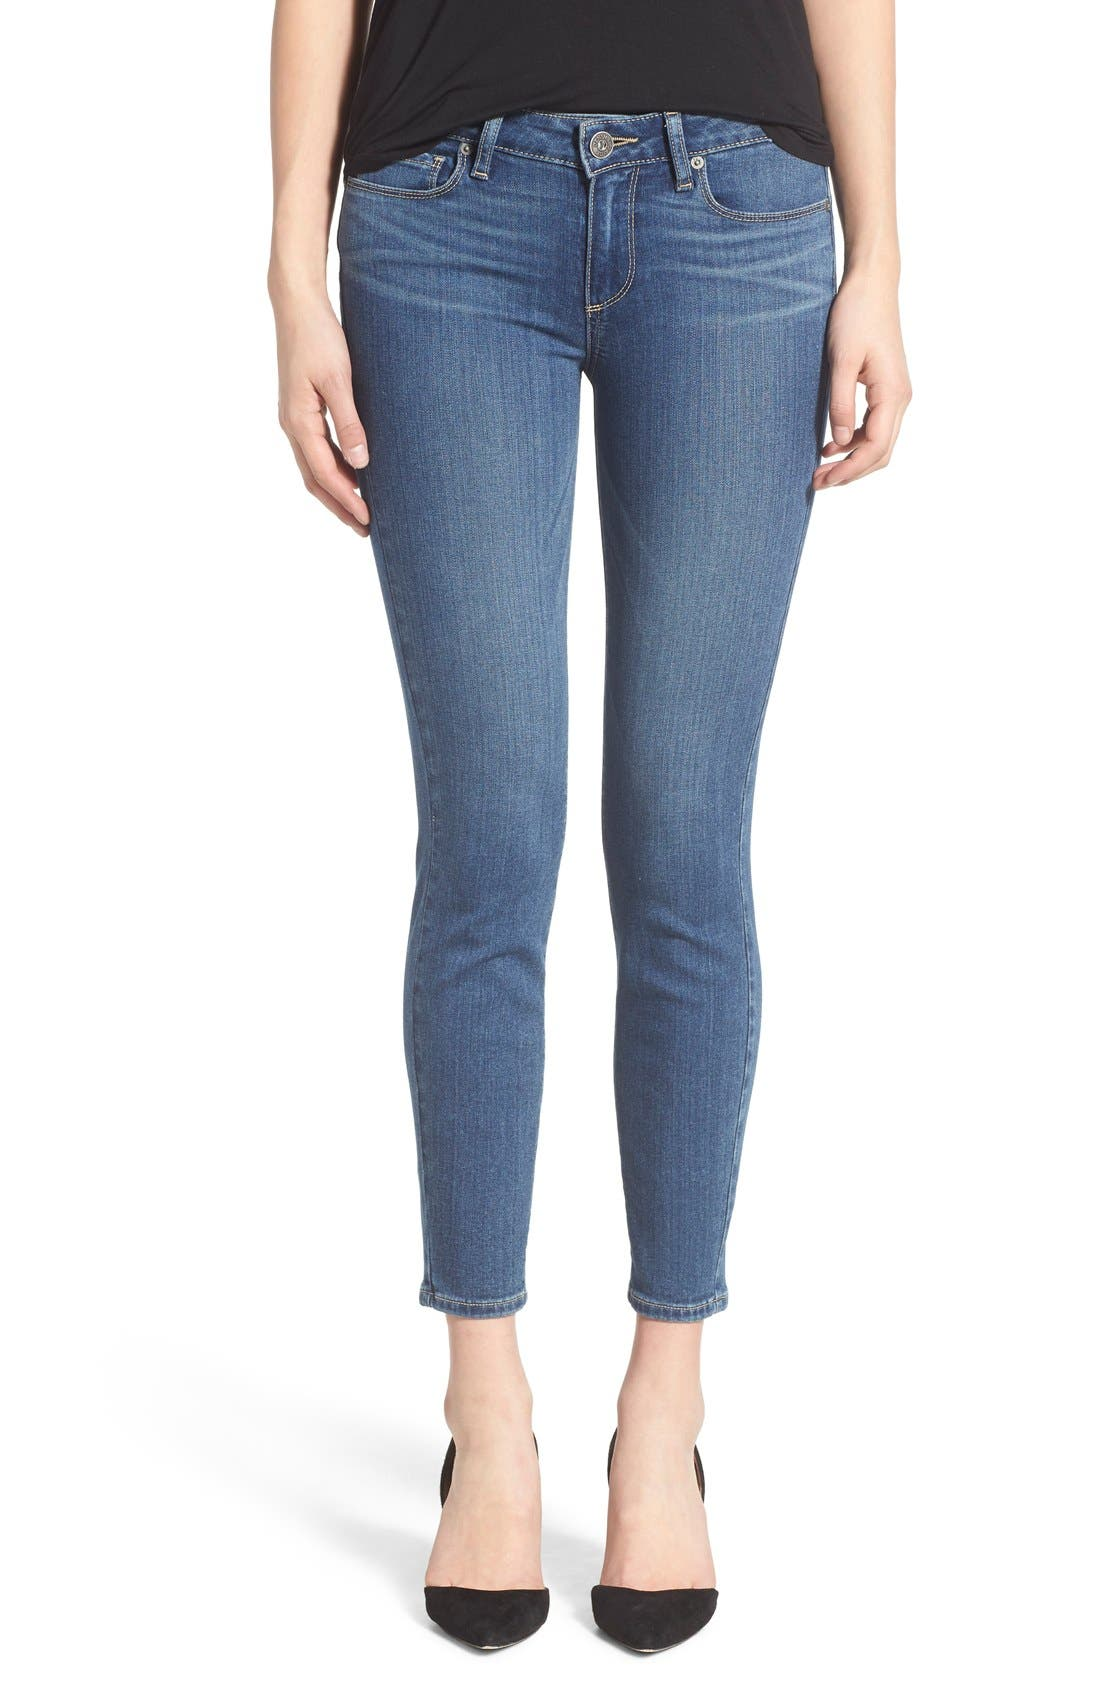 Main Image - Paige Denim 'Transcend - Verdugo' Crop Jeans (Nadeen)